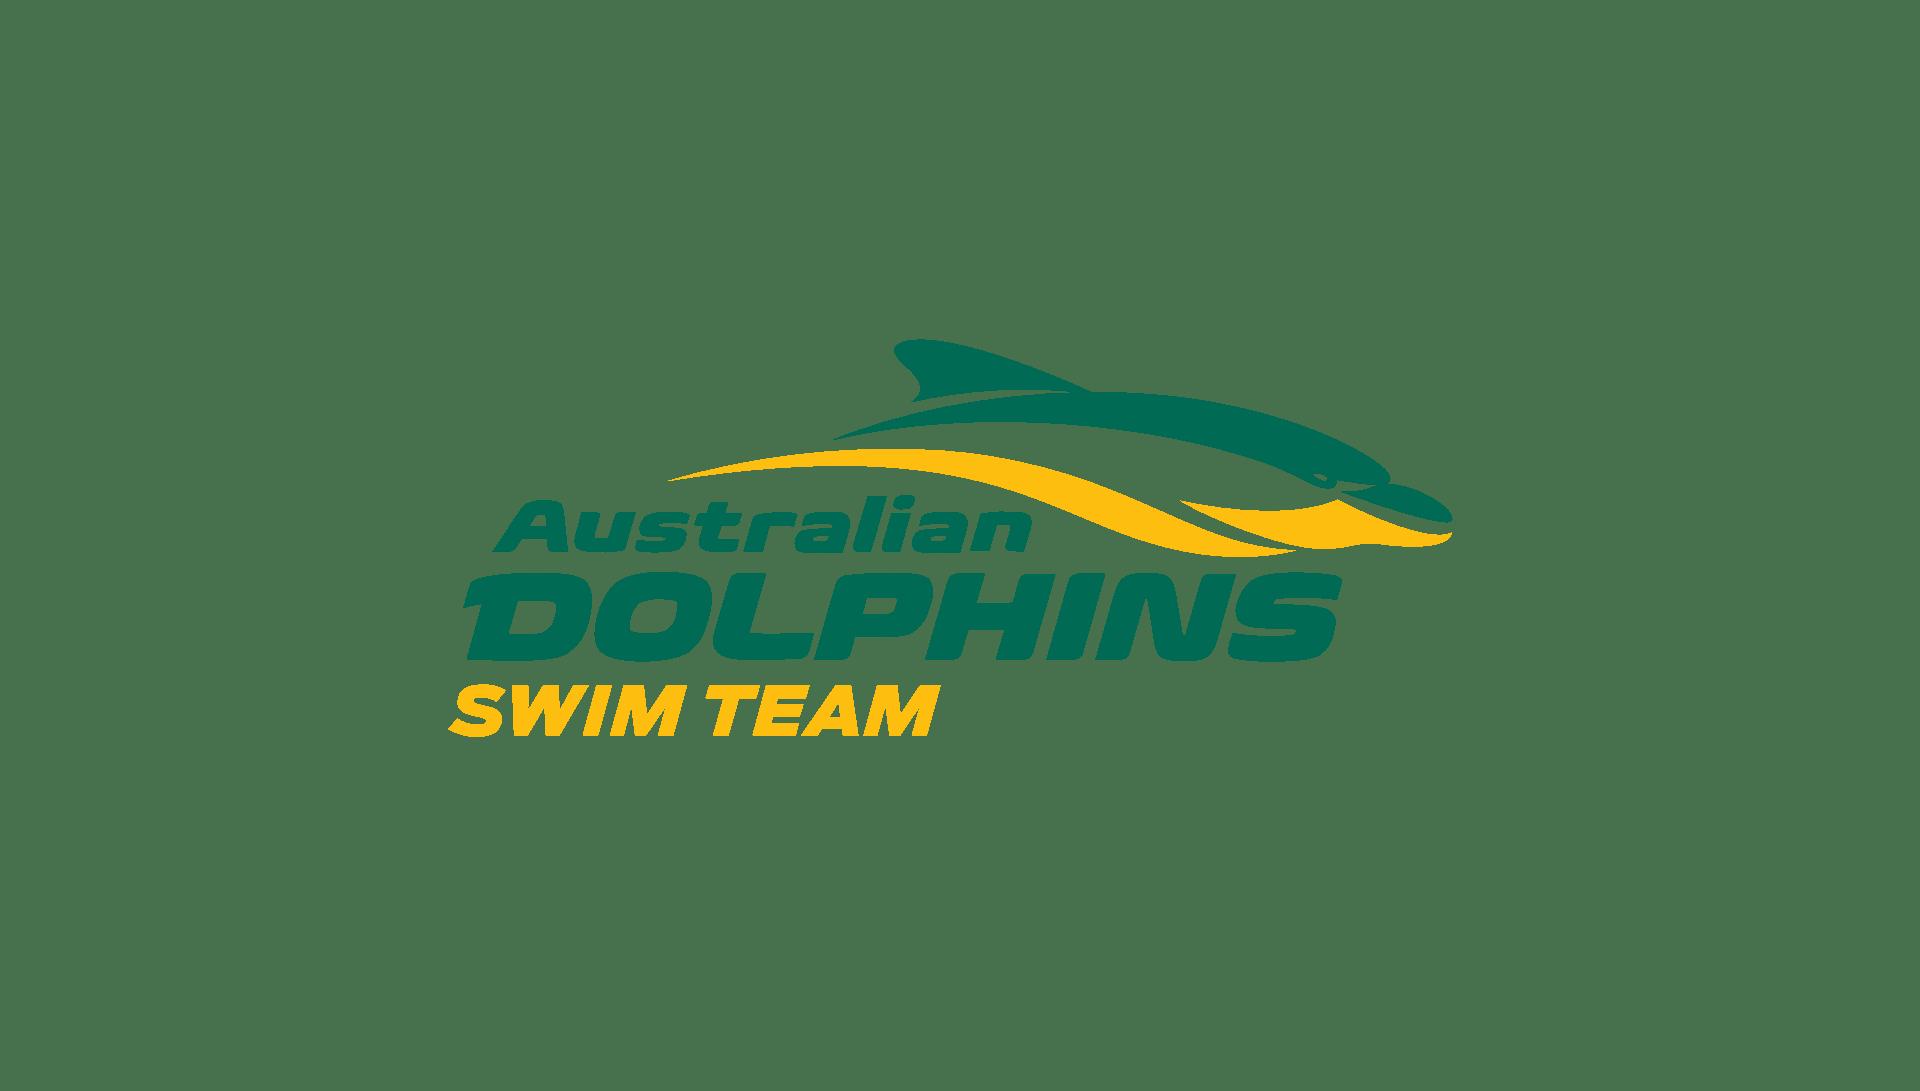 Australian Dolphins Swim Team